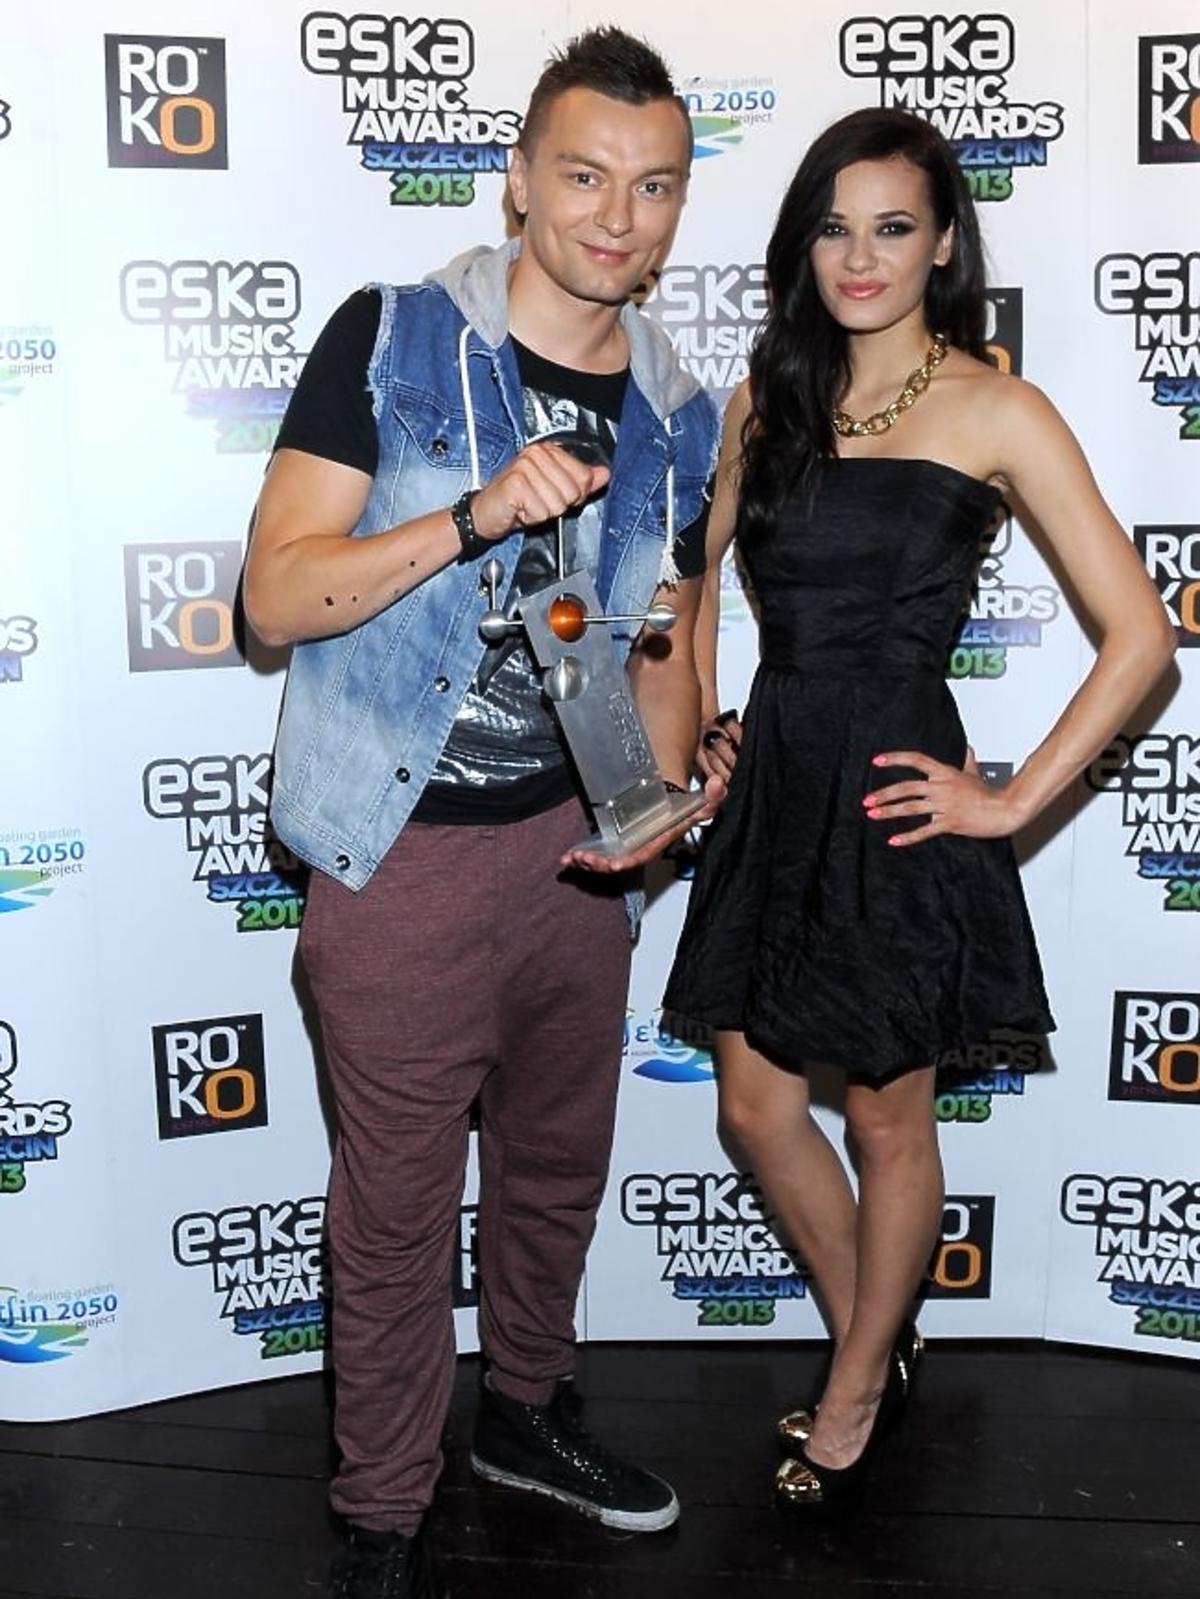 Liber i Natalia Schroeder na gali Eska Music Awards 2013